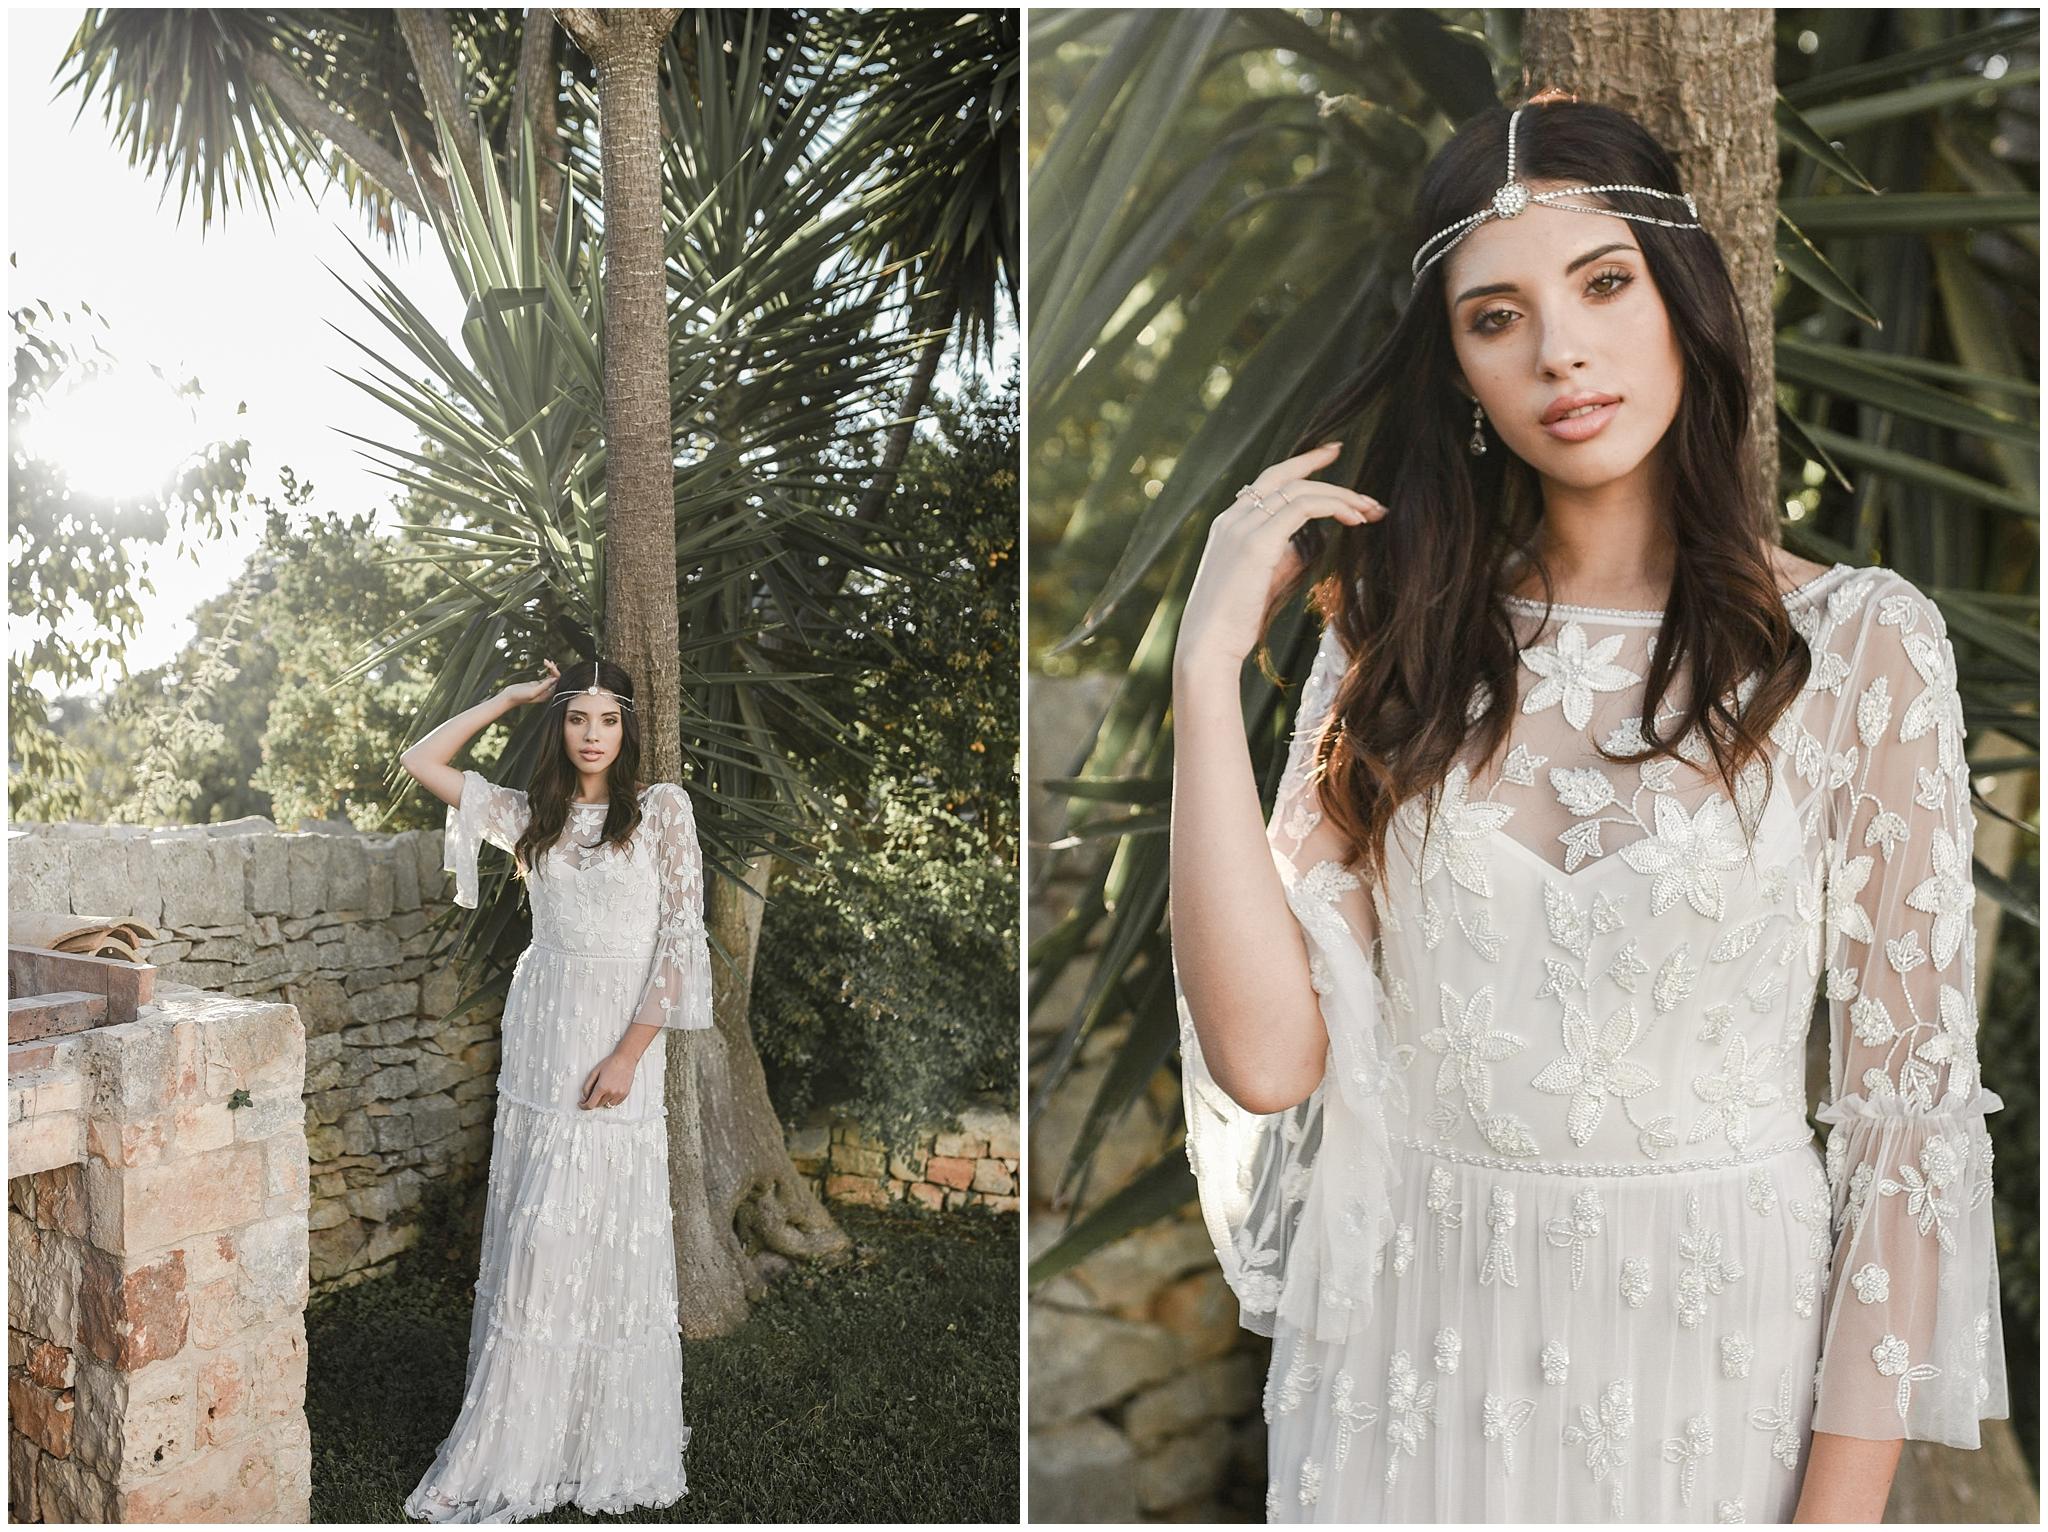 Puglia-Tara-Florence-Bridal-Editorial-155_WEB.jpg